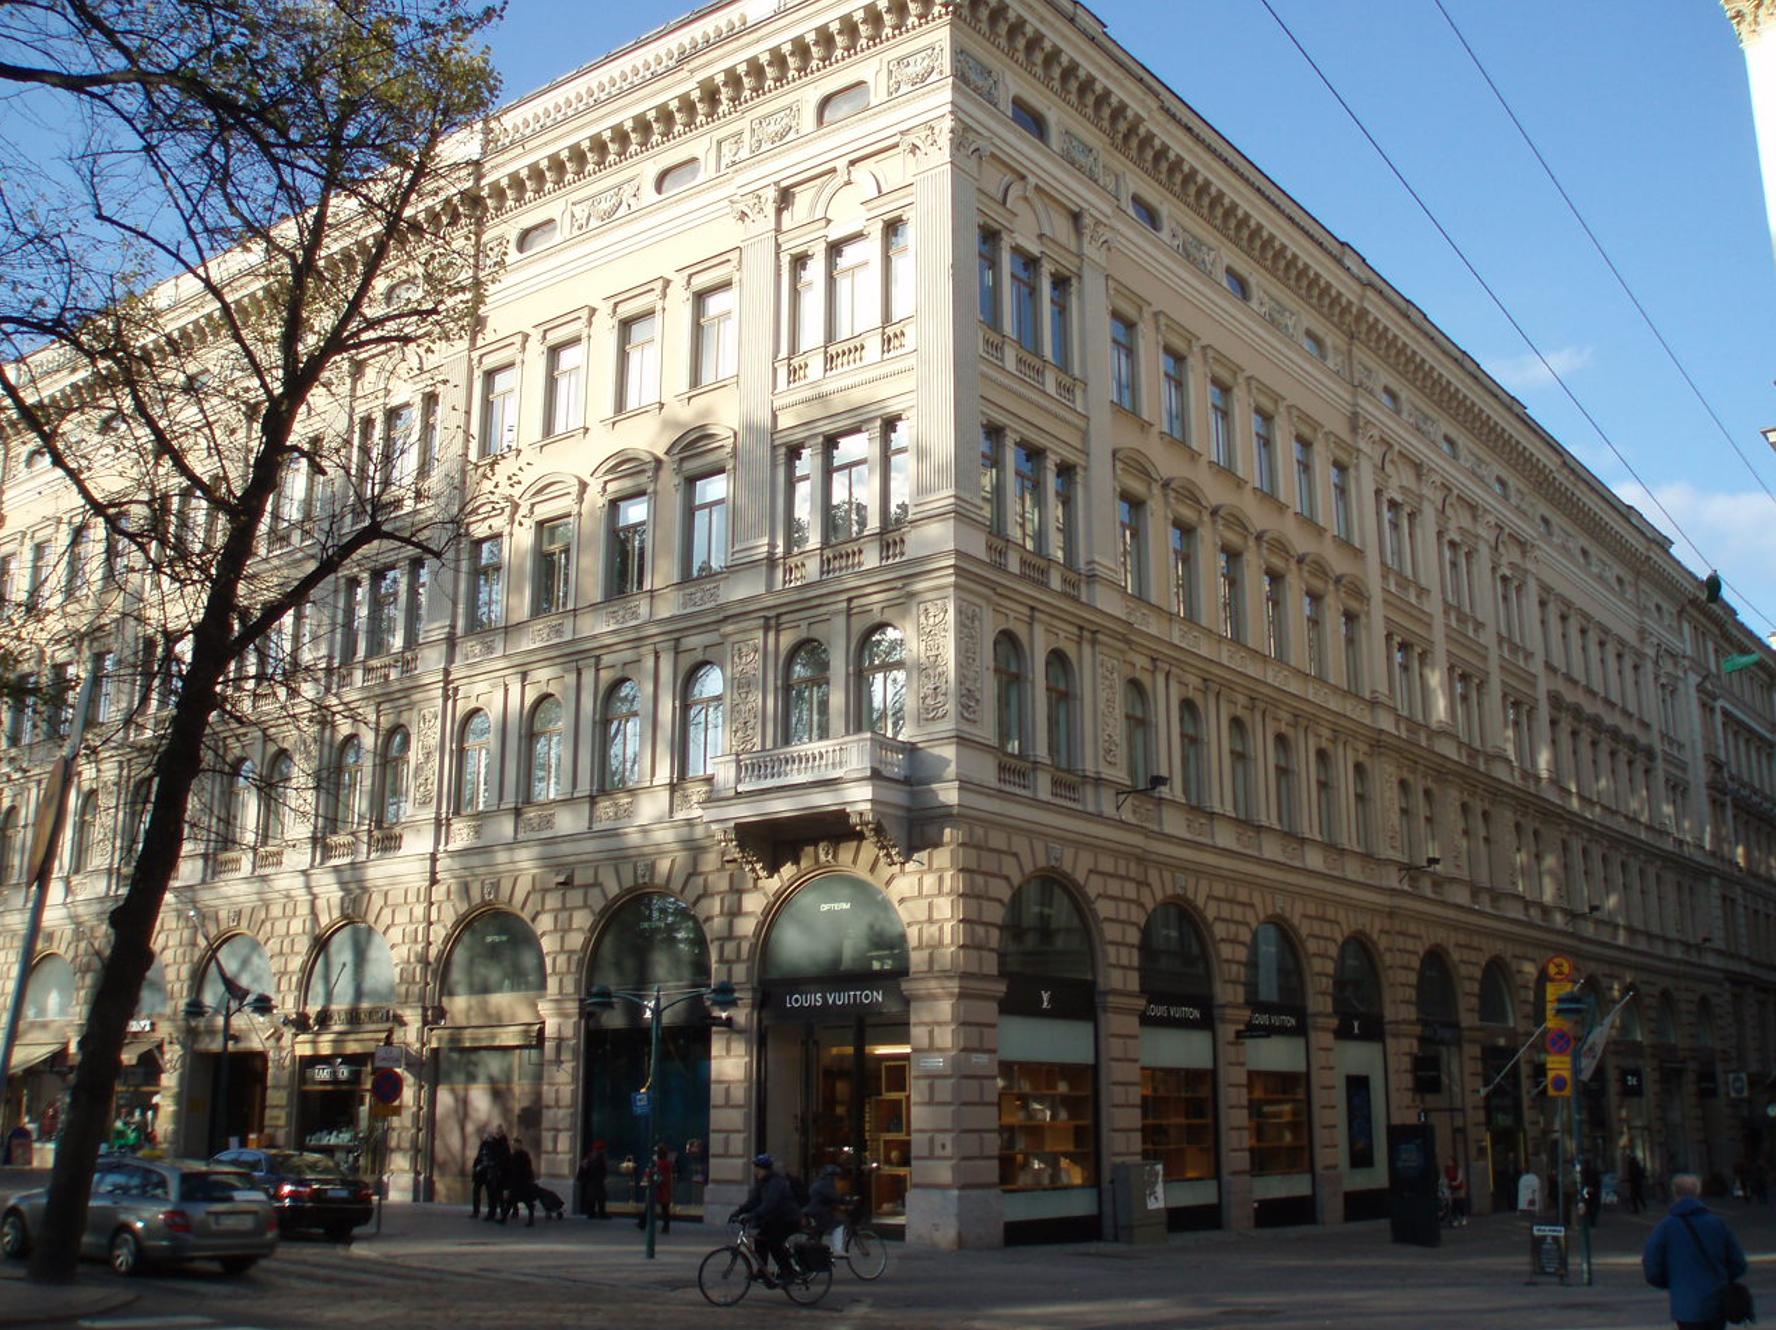 Toimitila, Mikonkatu 2, Kluuvi, Helsinki